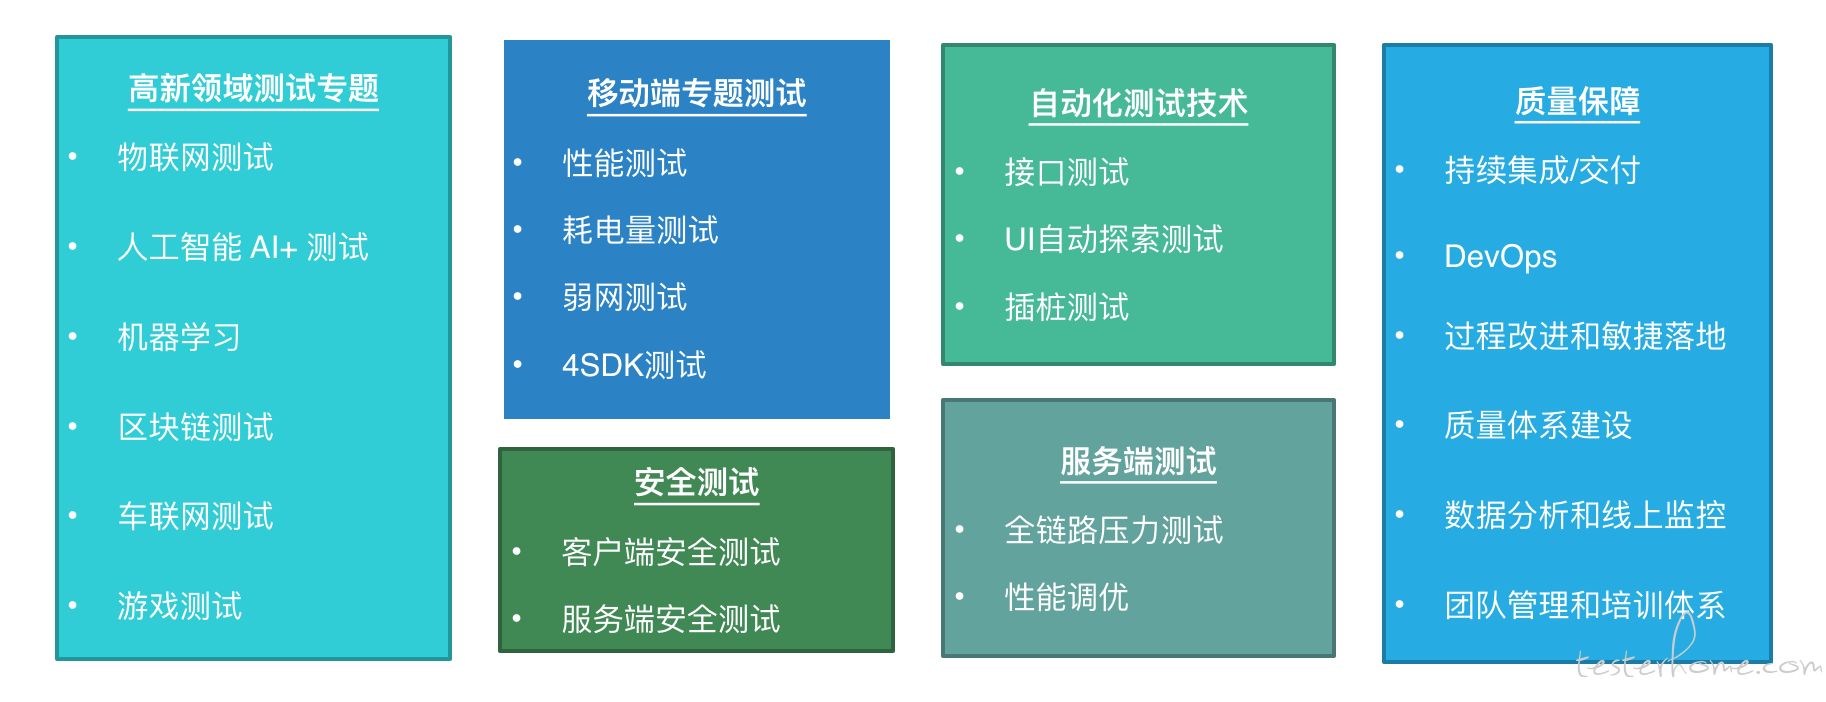 MTSC2019中國移動互聯網測試開發大會 深圳站